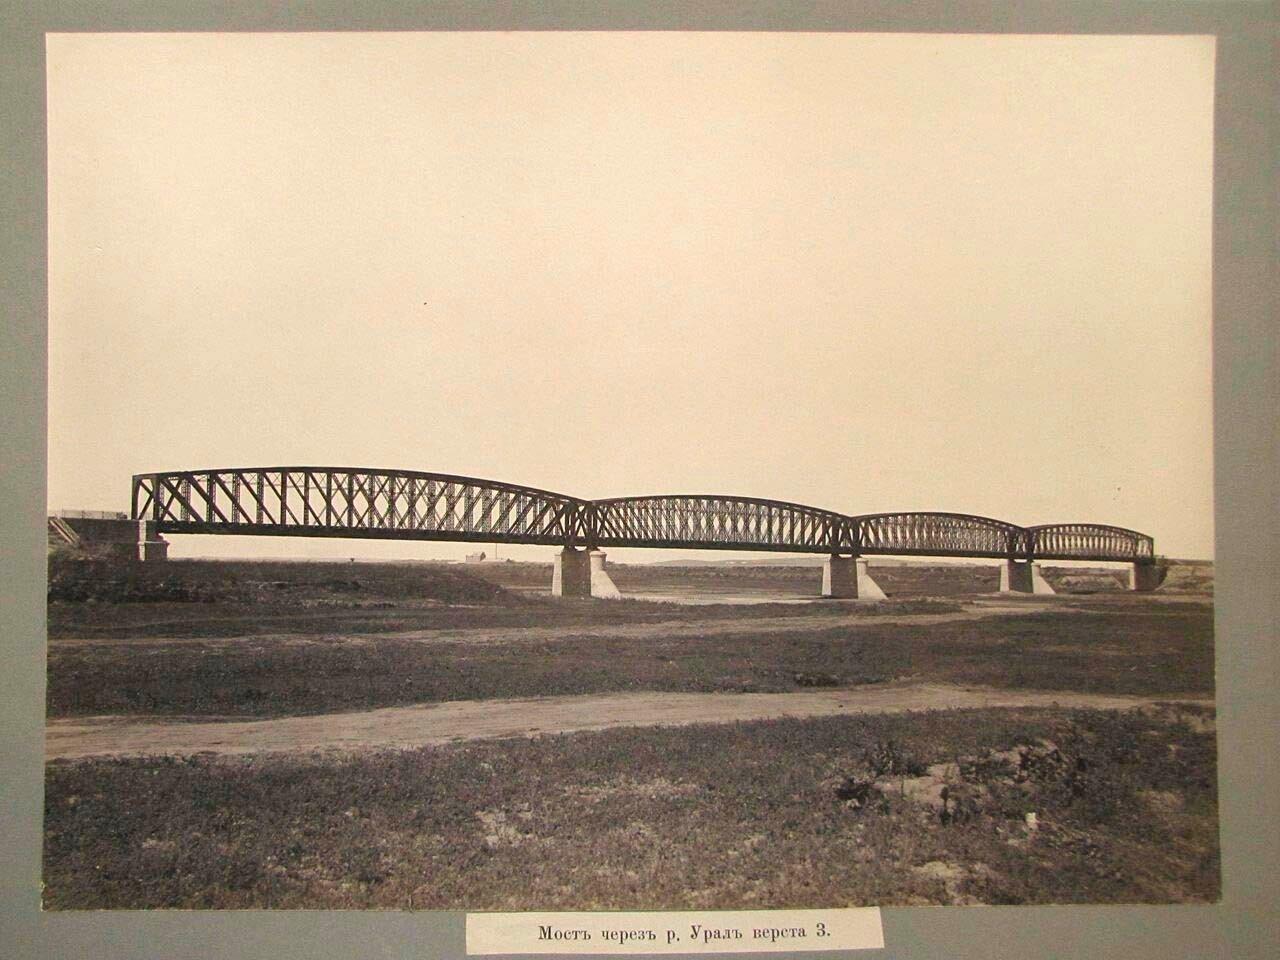 28. Мост через р.Урал, верста 3